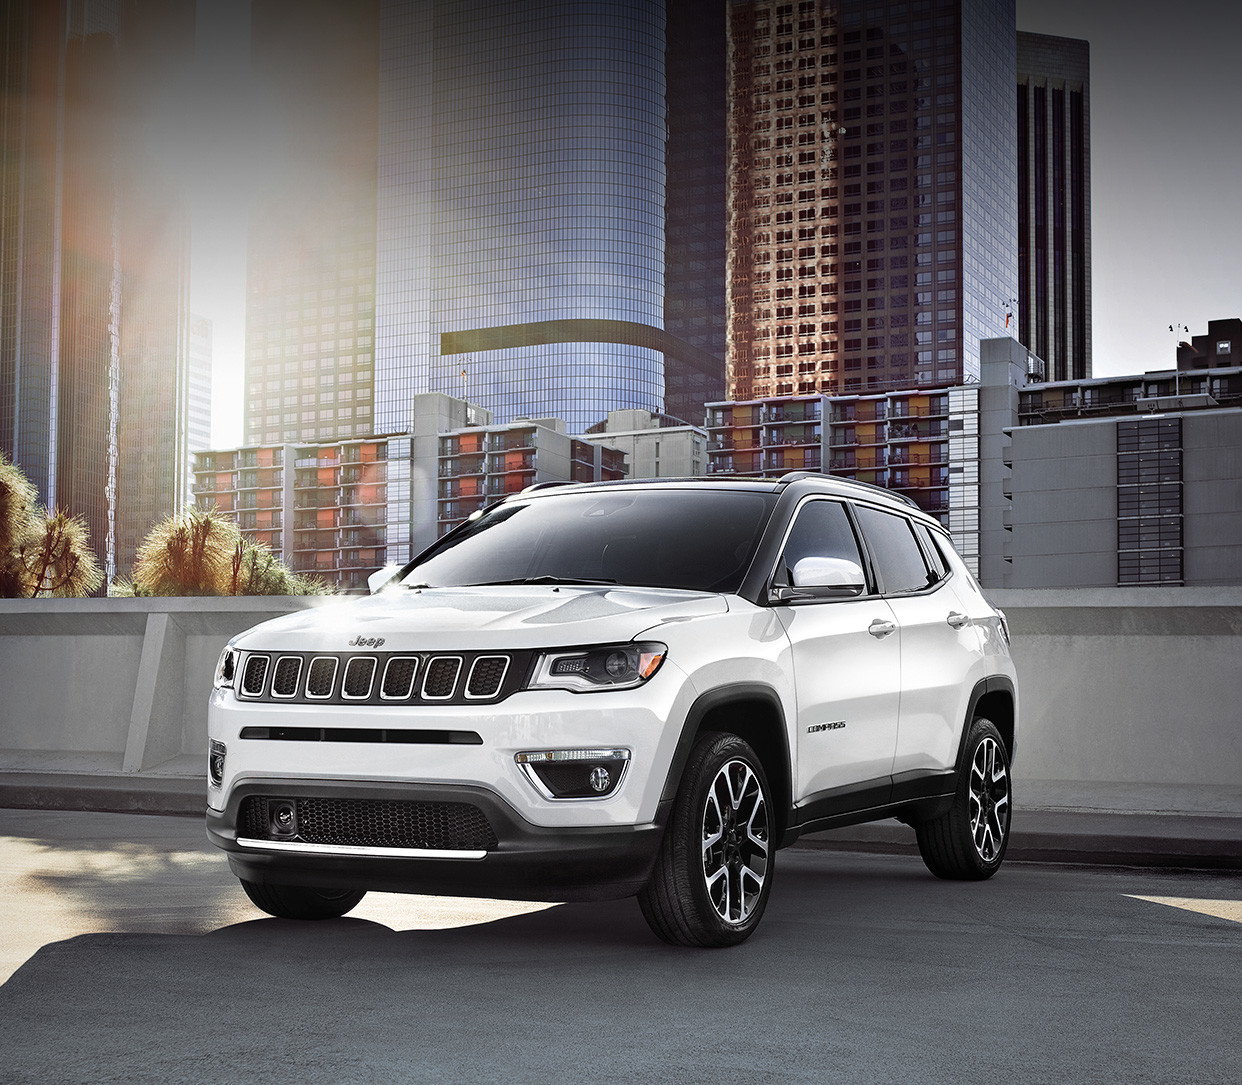 2019 Jeep Compass Compact SUV